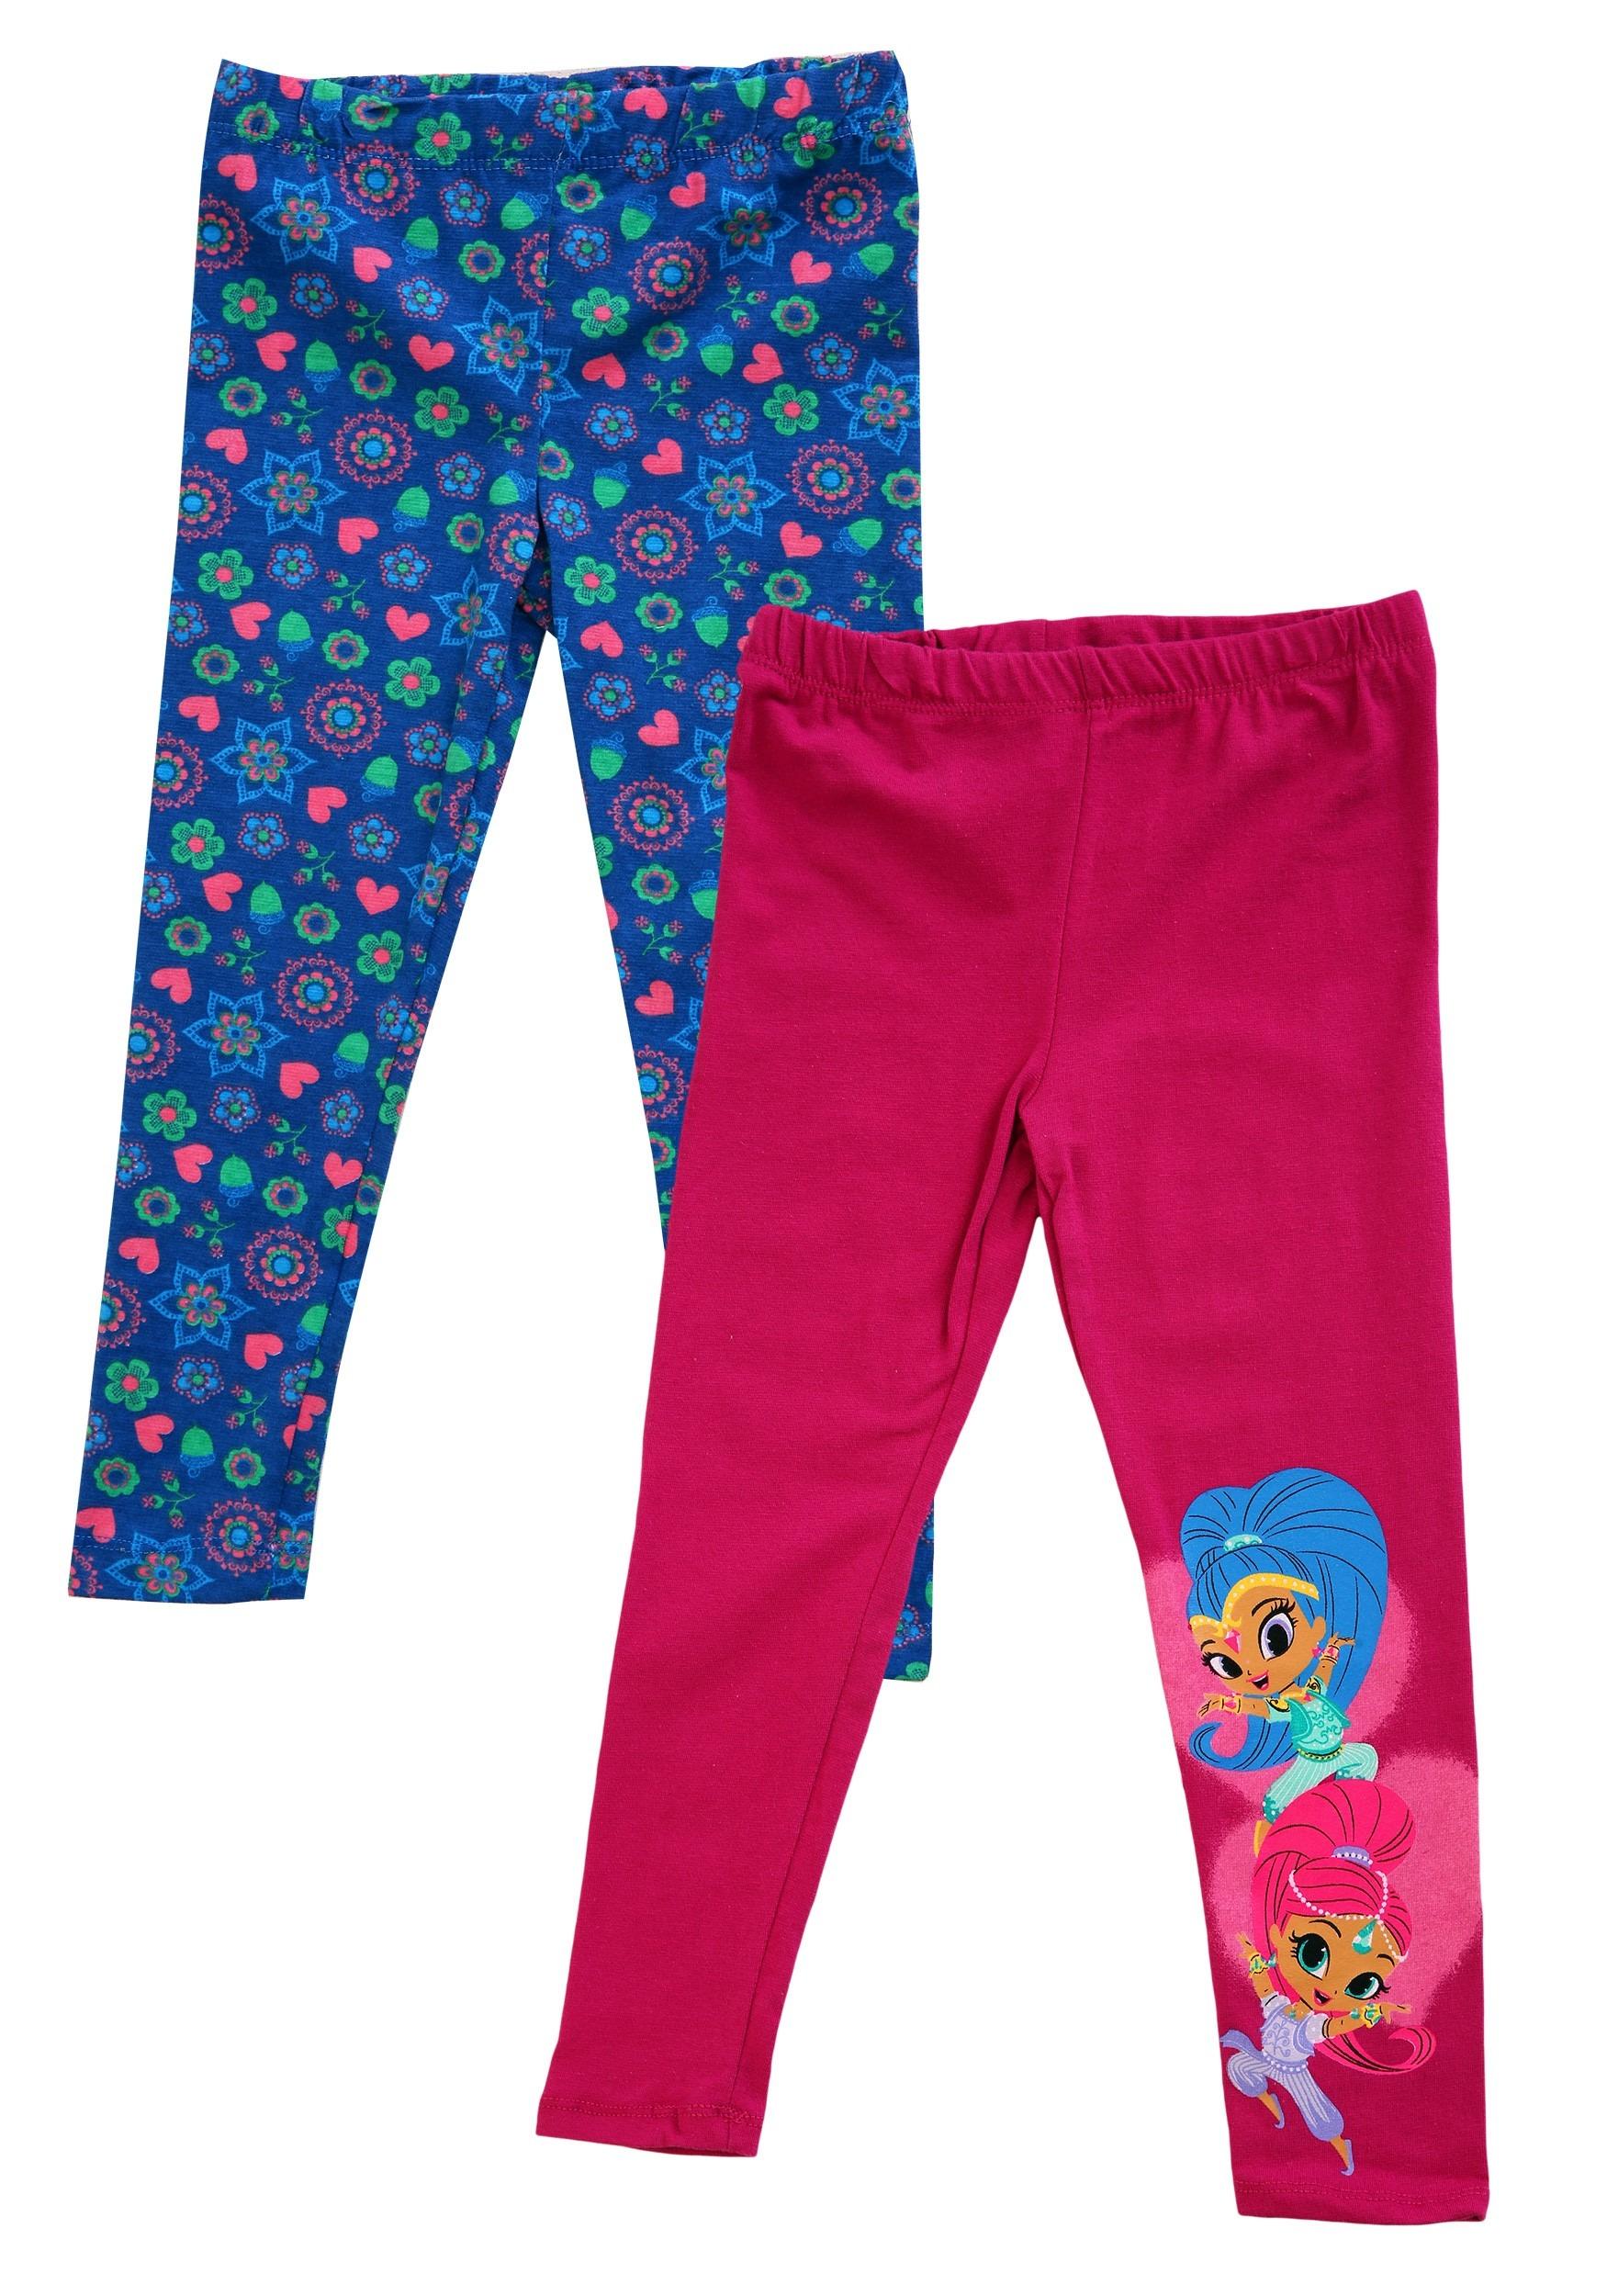 4038414e6a6d8 2 Pack of Shimmer & Shine Girl's Jogger Pants Update Main